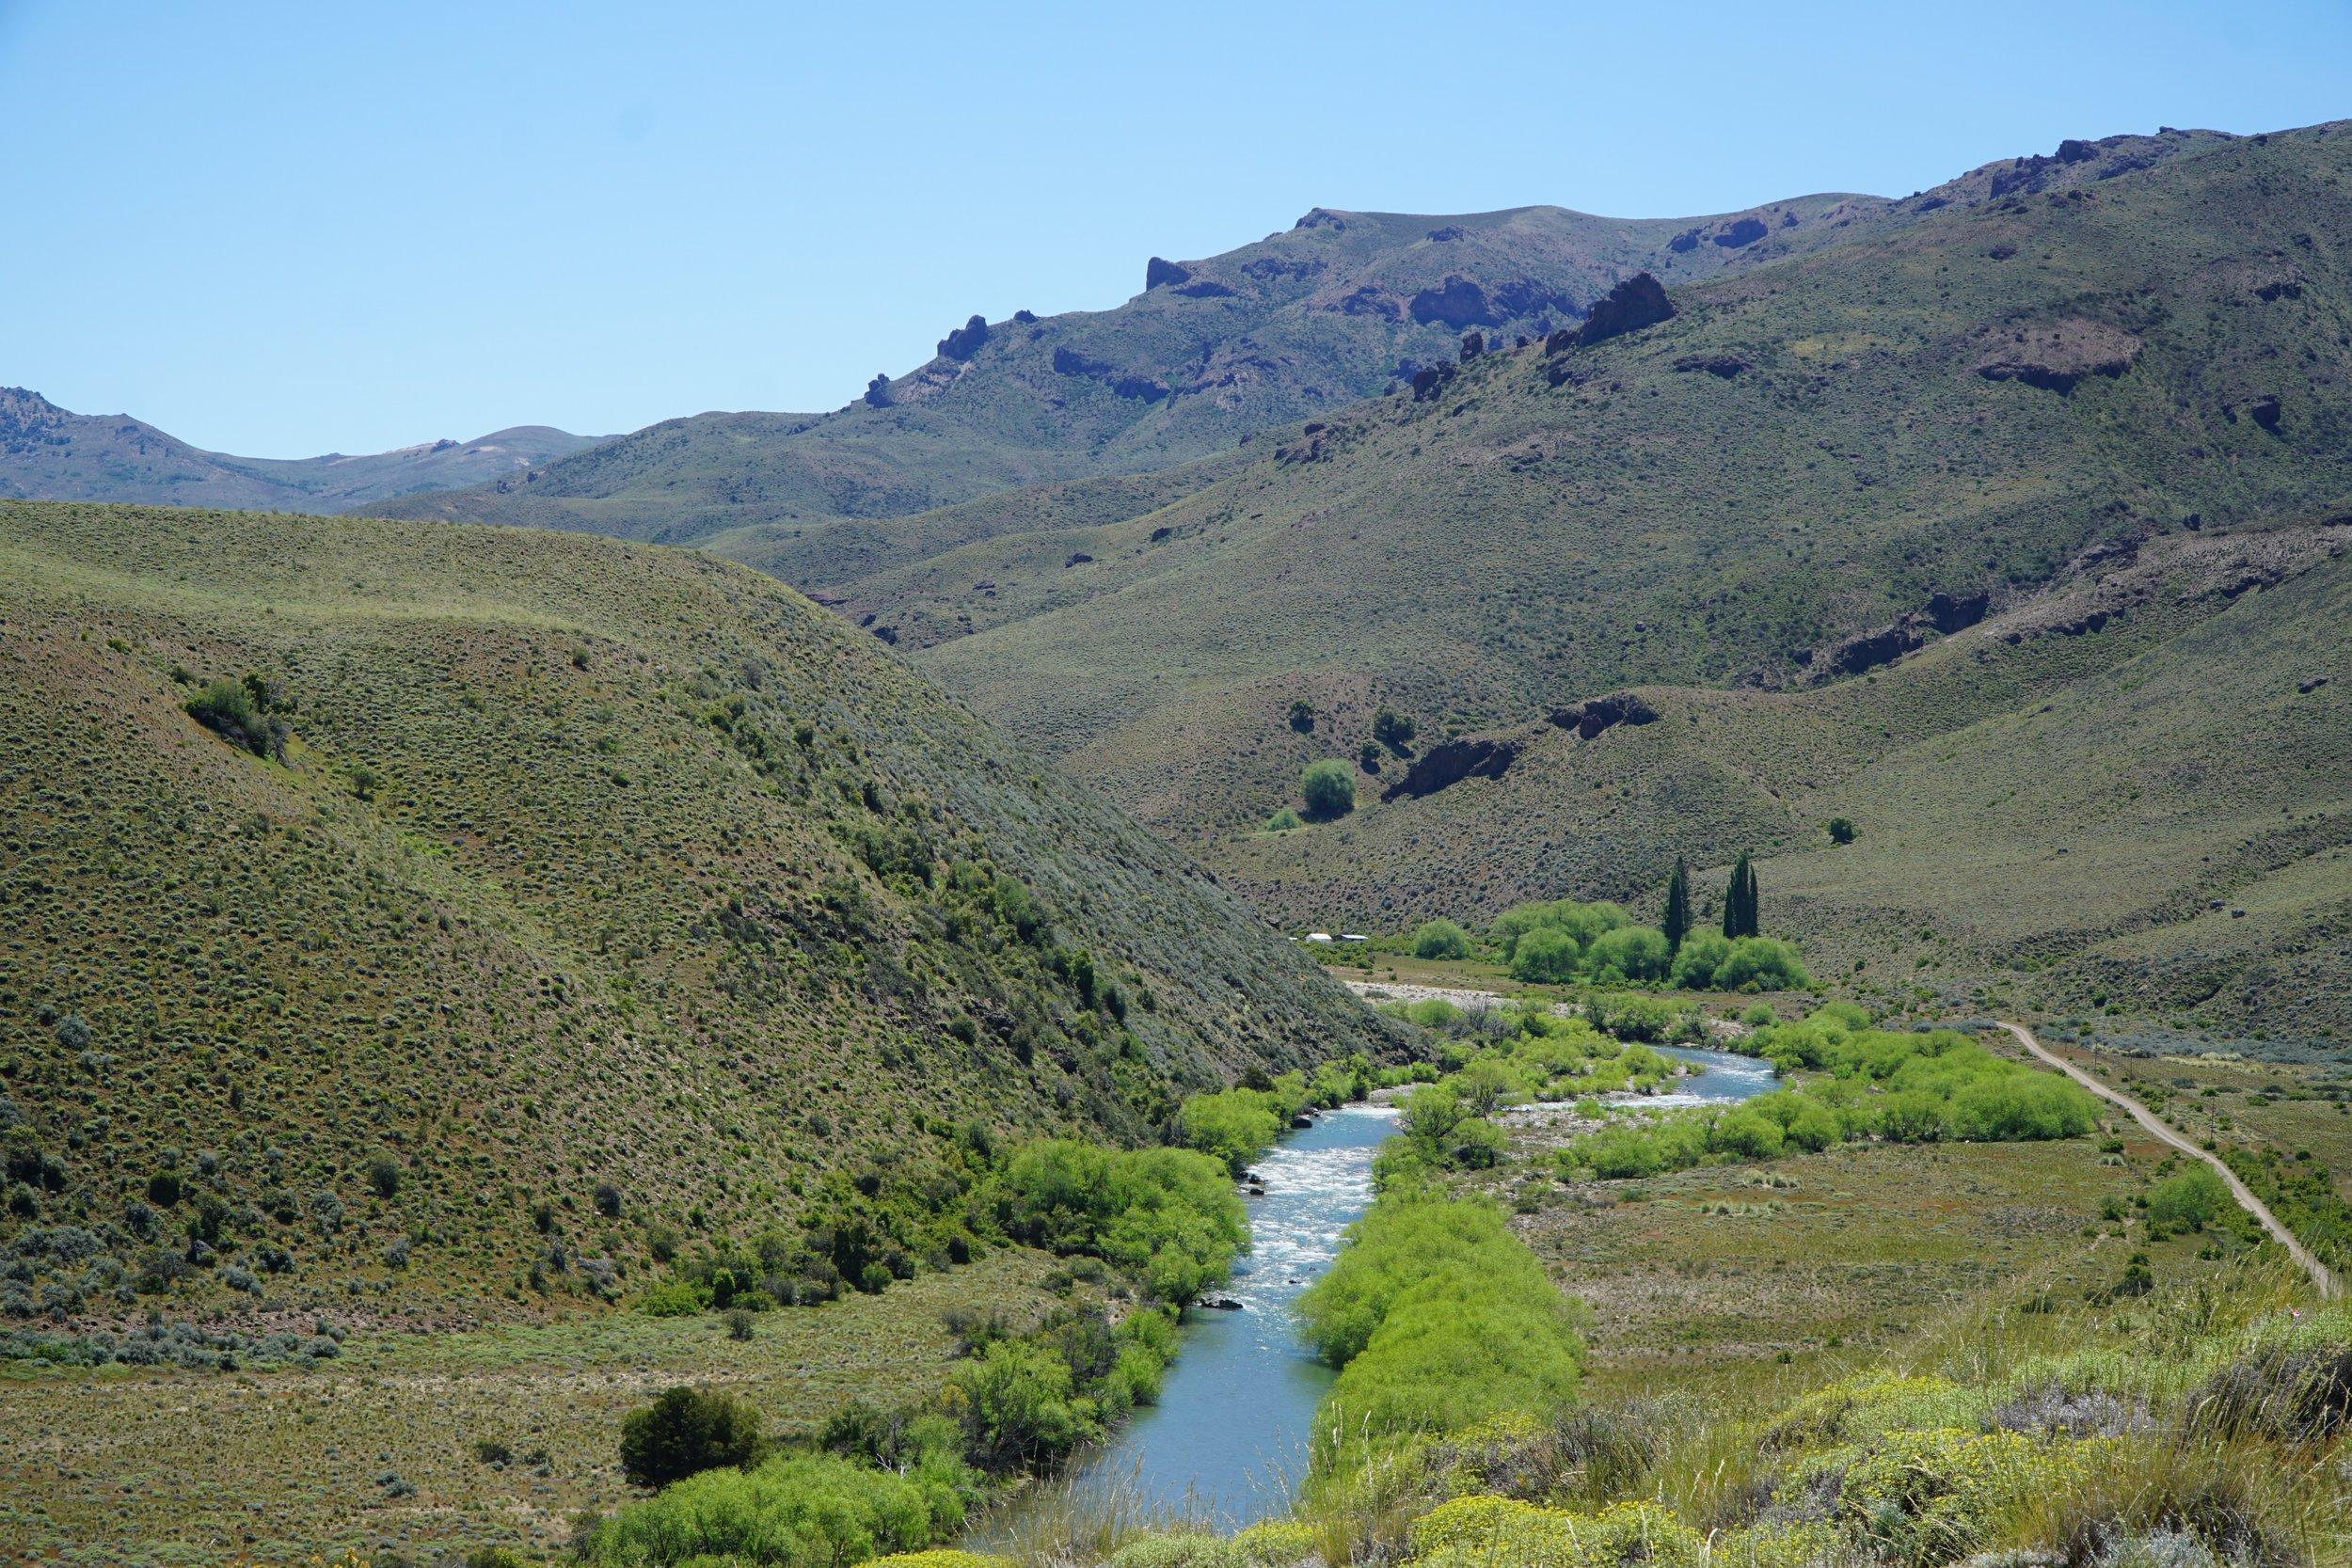 Rio Chubut